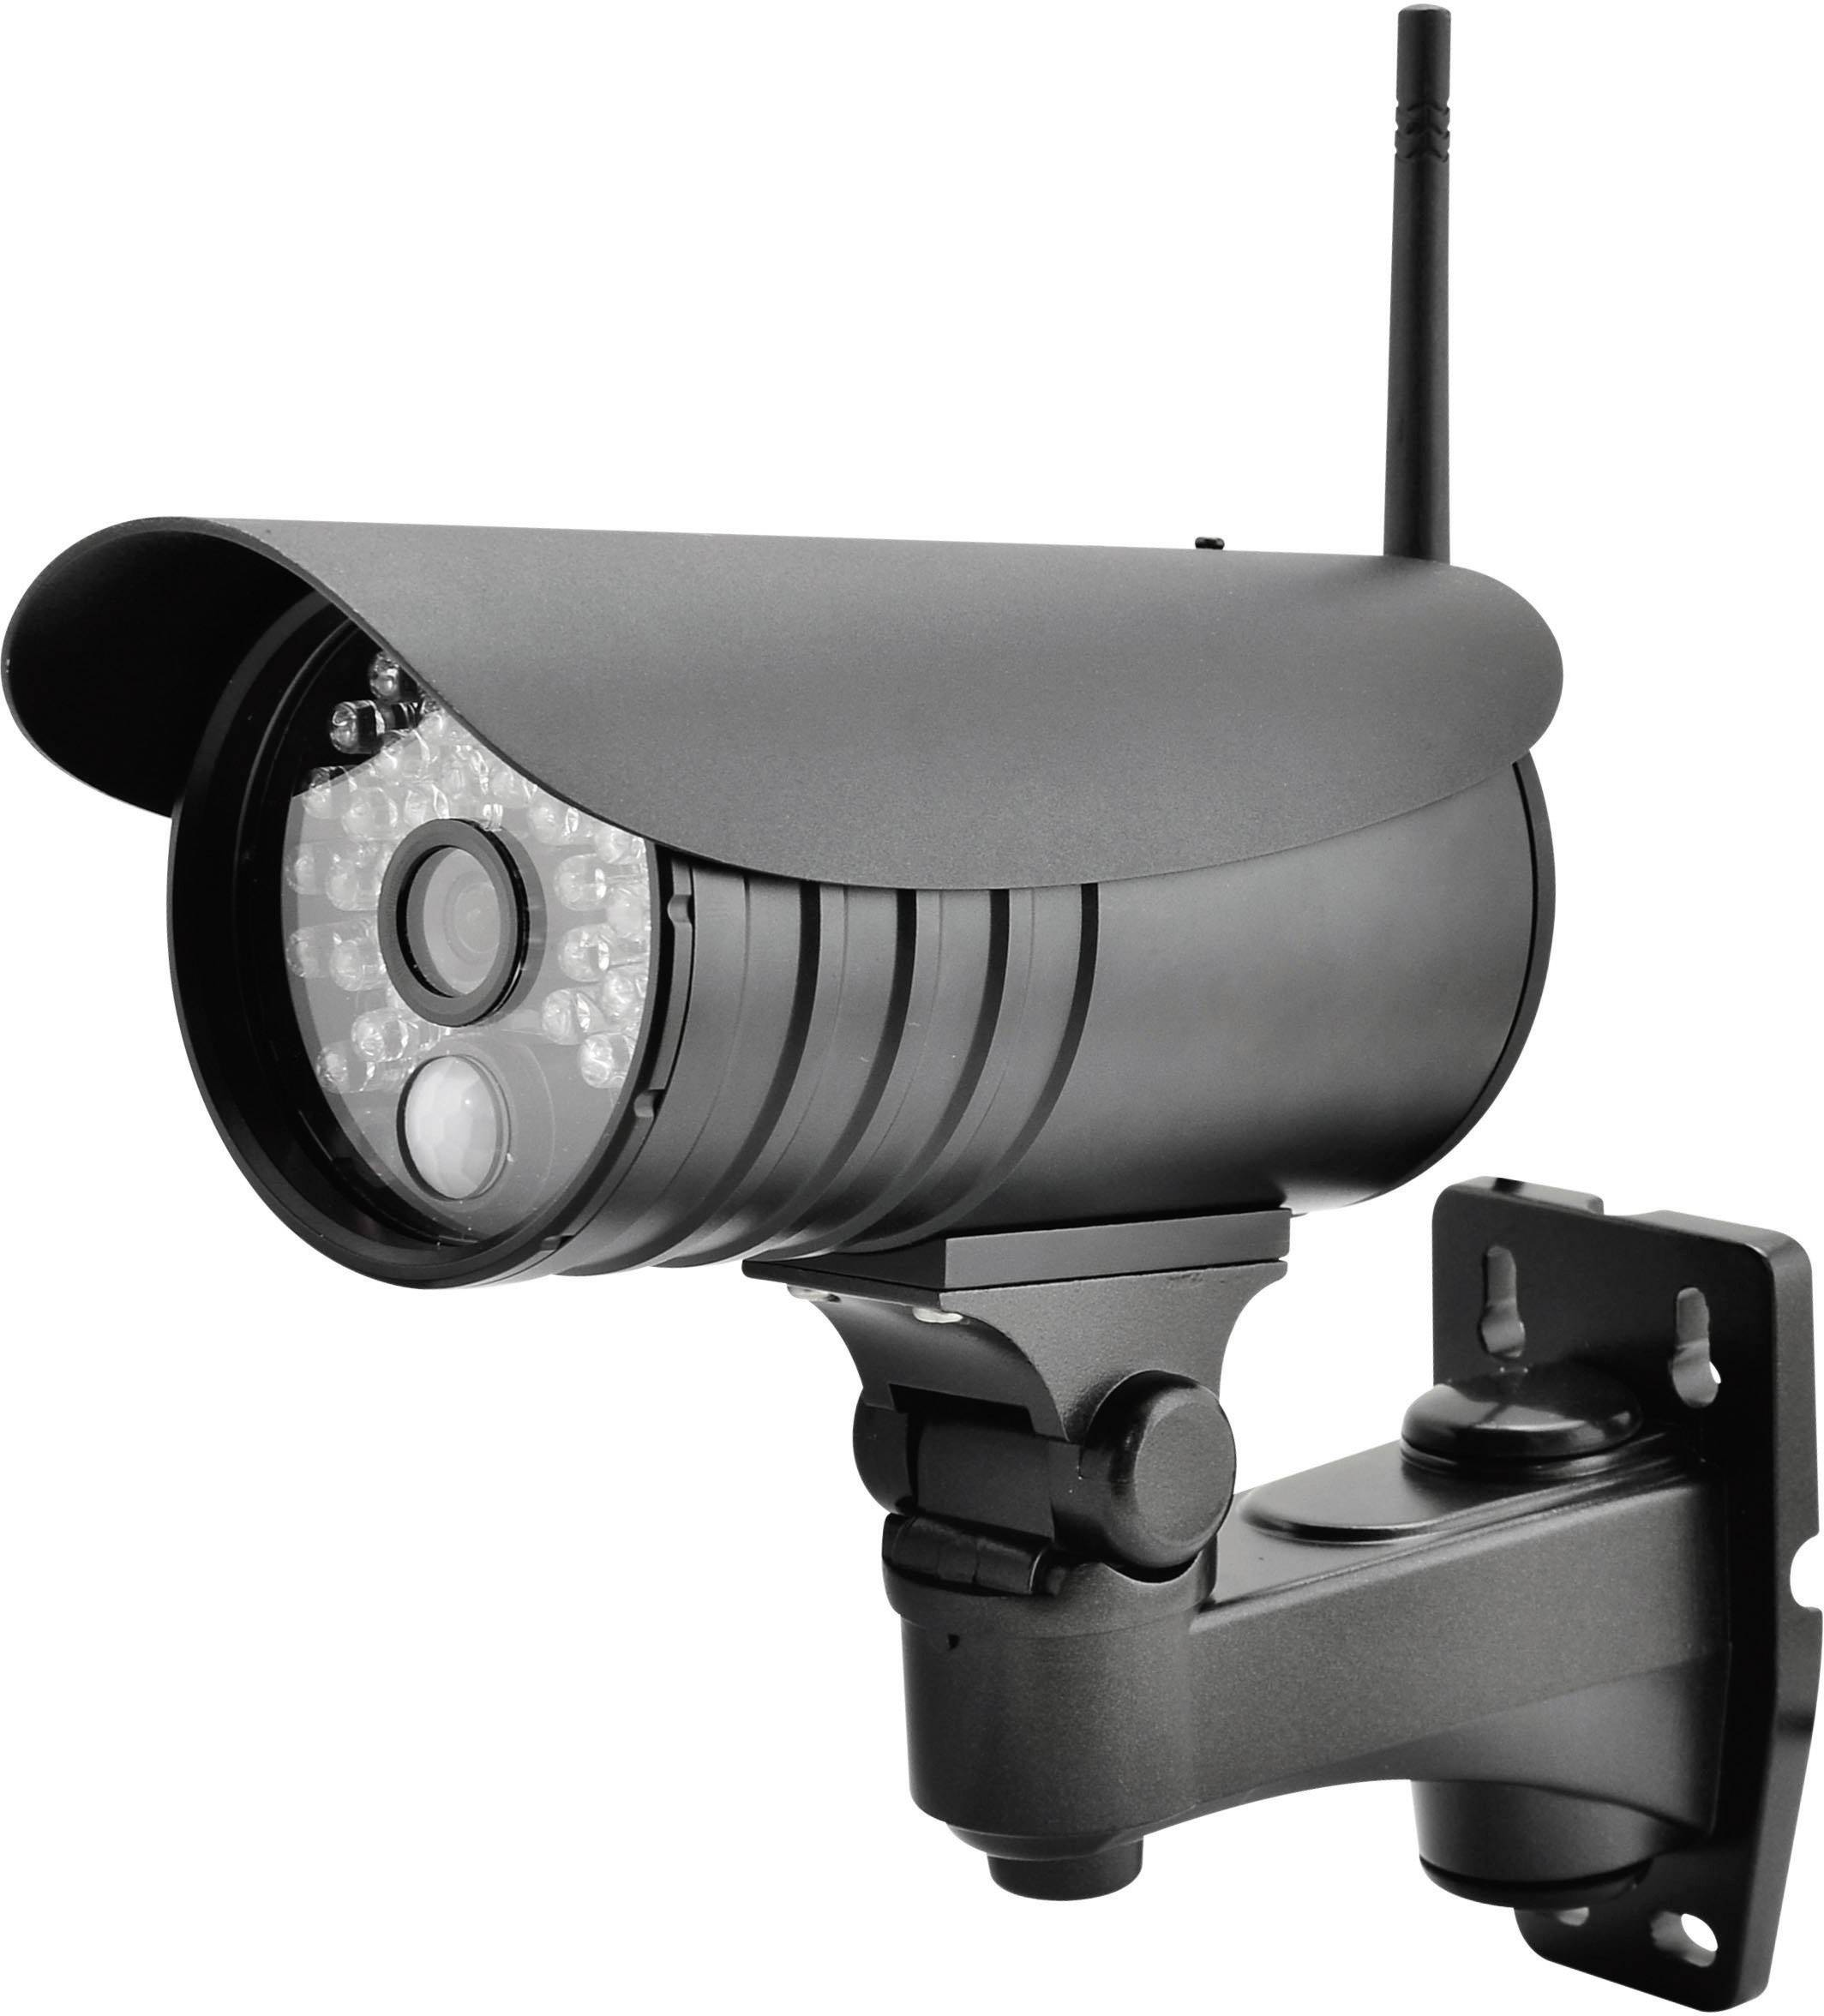 Bezdrôtová vonkajšia kamera 2.4 GHz dnt QuattSecure 52206, IP66